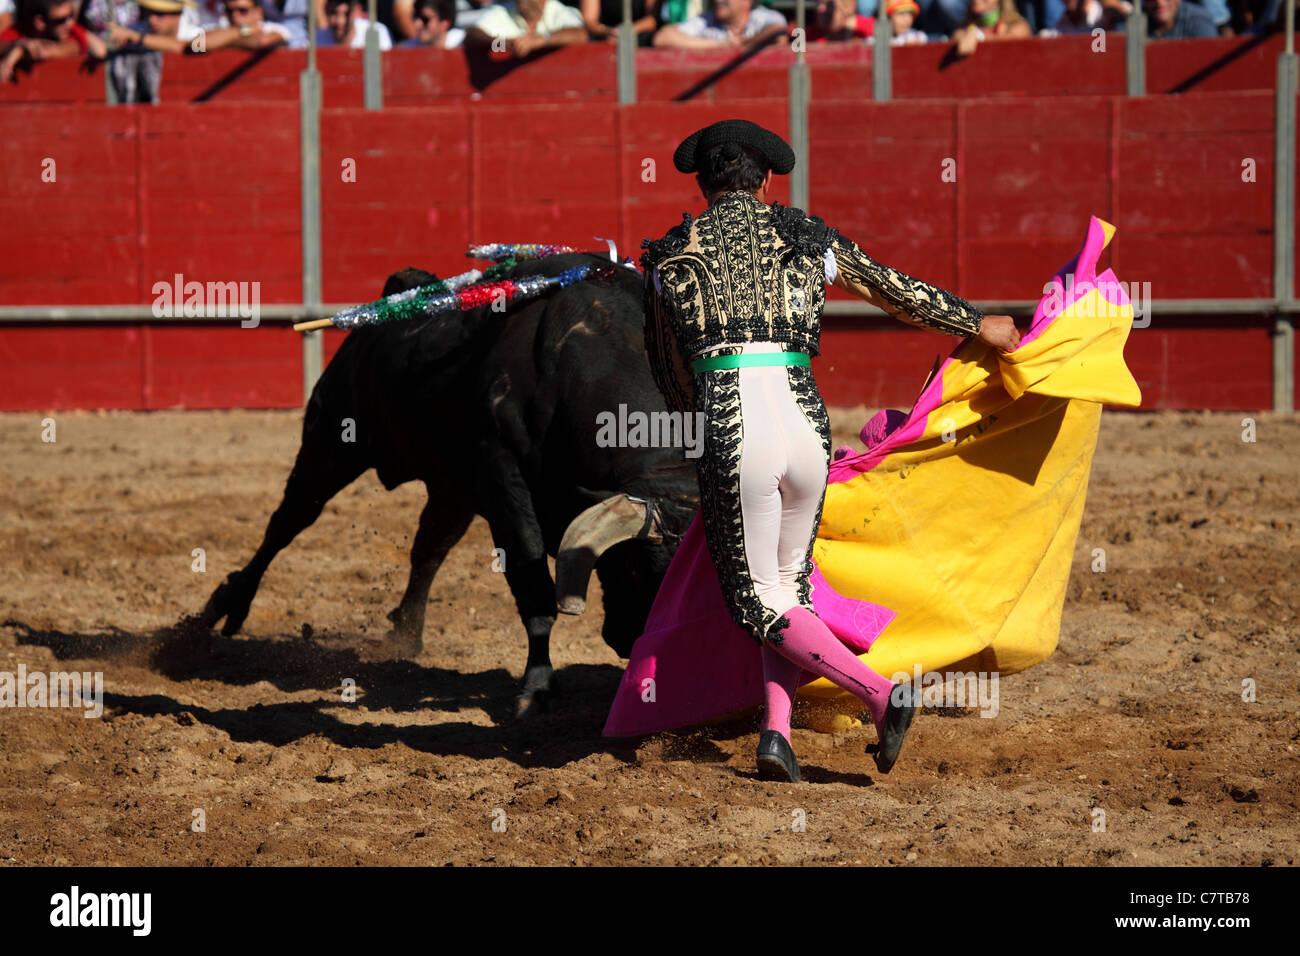 Un torero (Bandarilheiro) en acción durante una corrida de toros. Imagen De  Stock ccb70855880